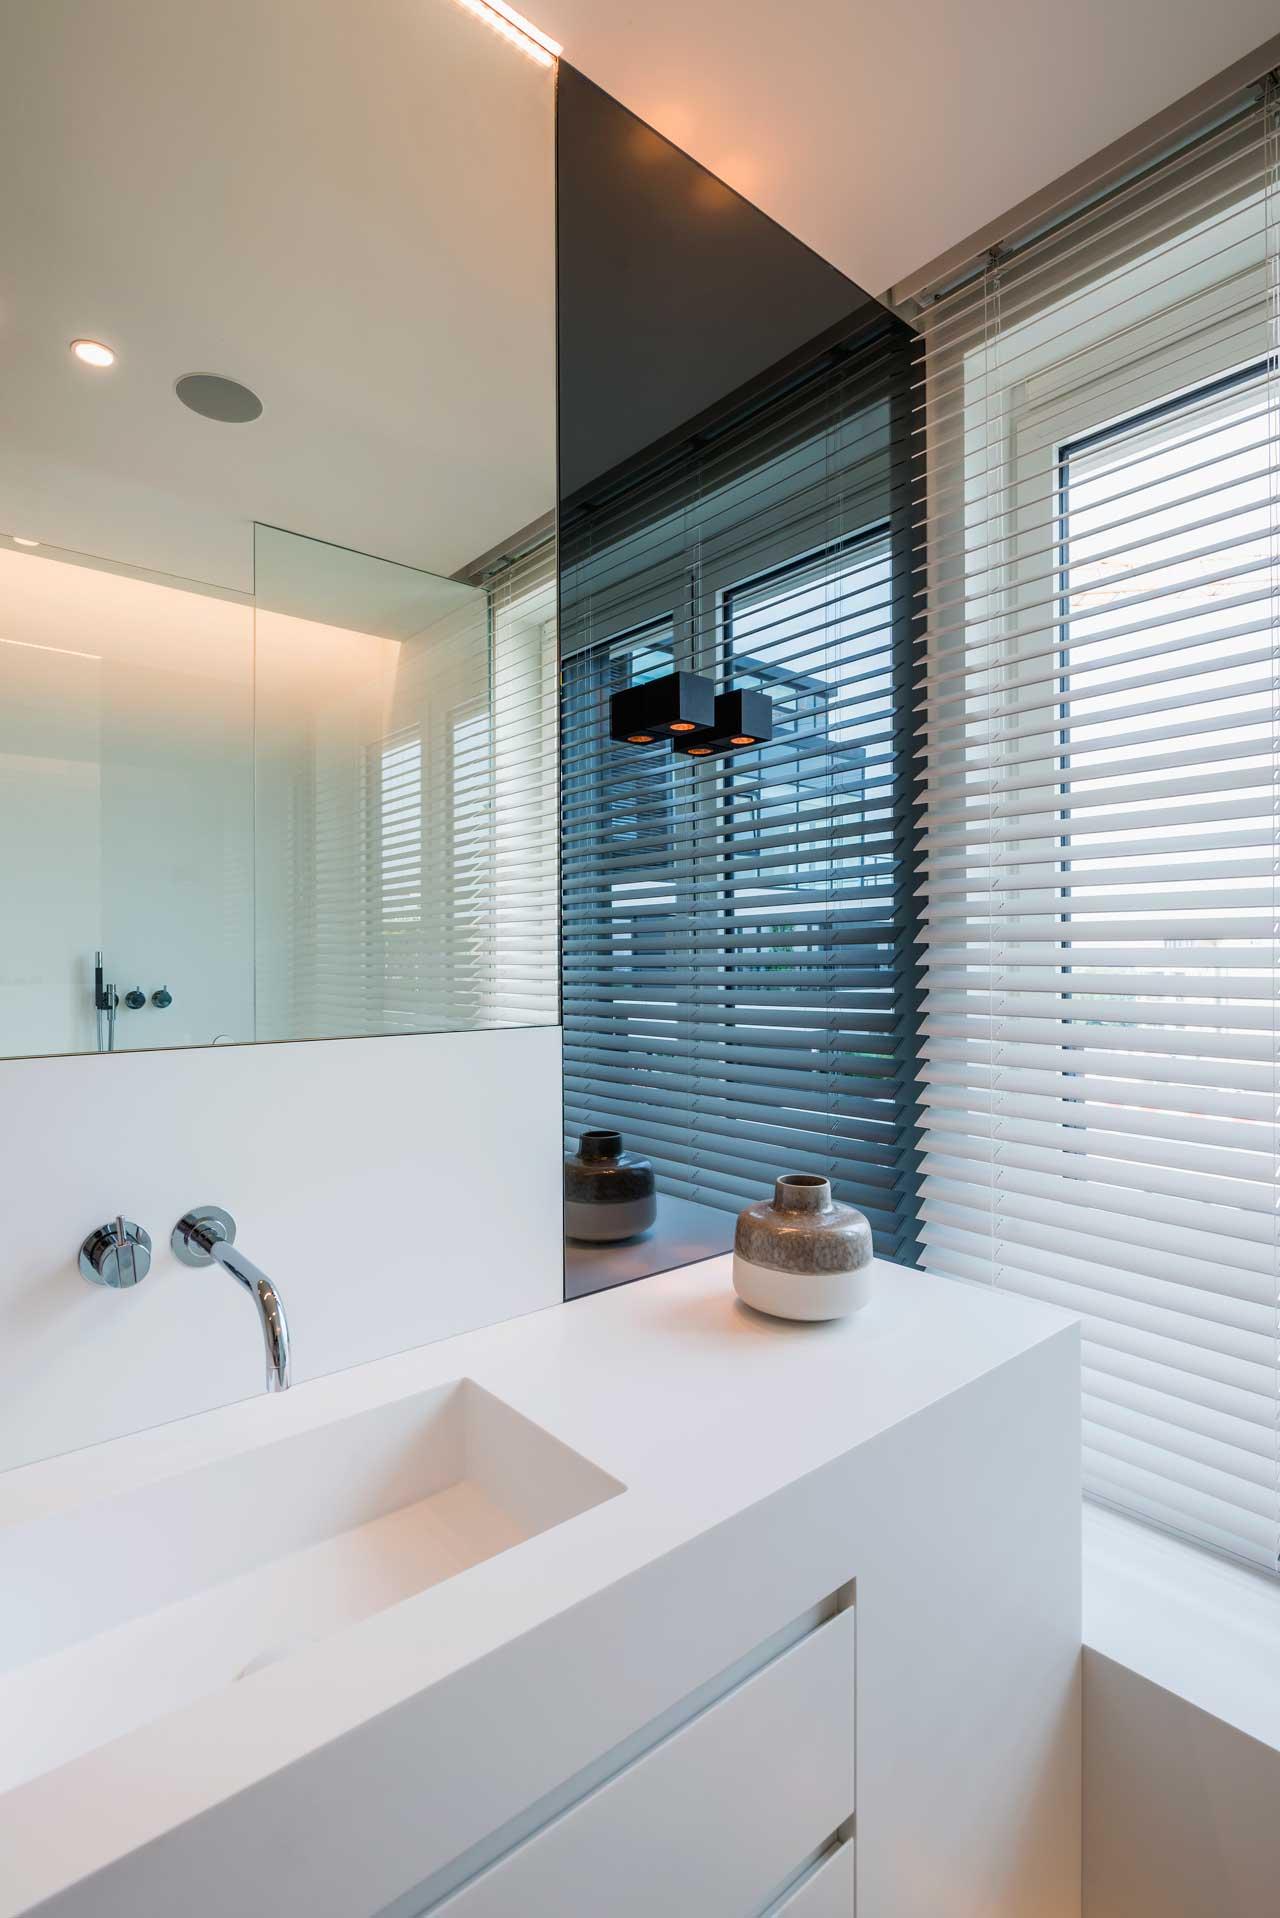 vivienda particular - hasselt - bélgica. Solid Surface  浴室设备